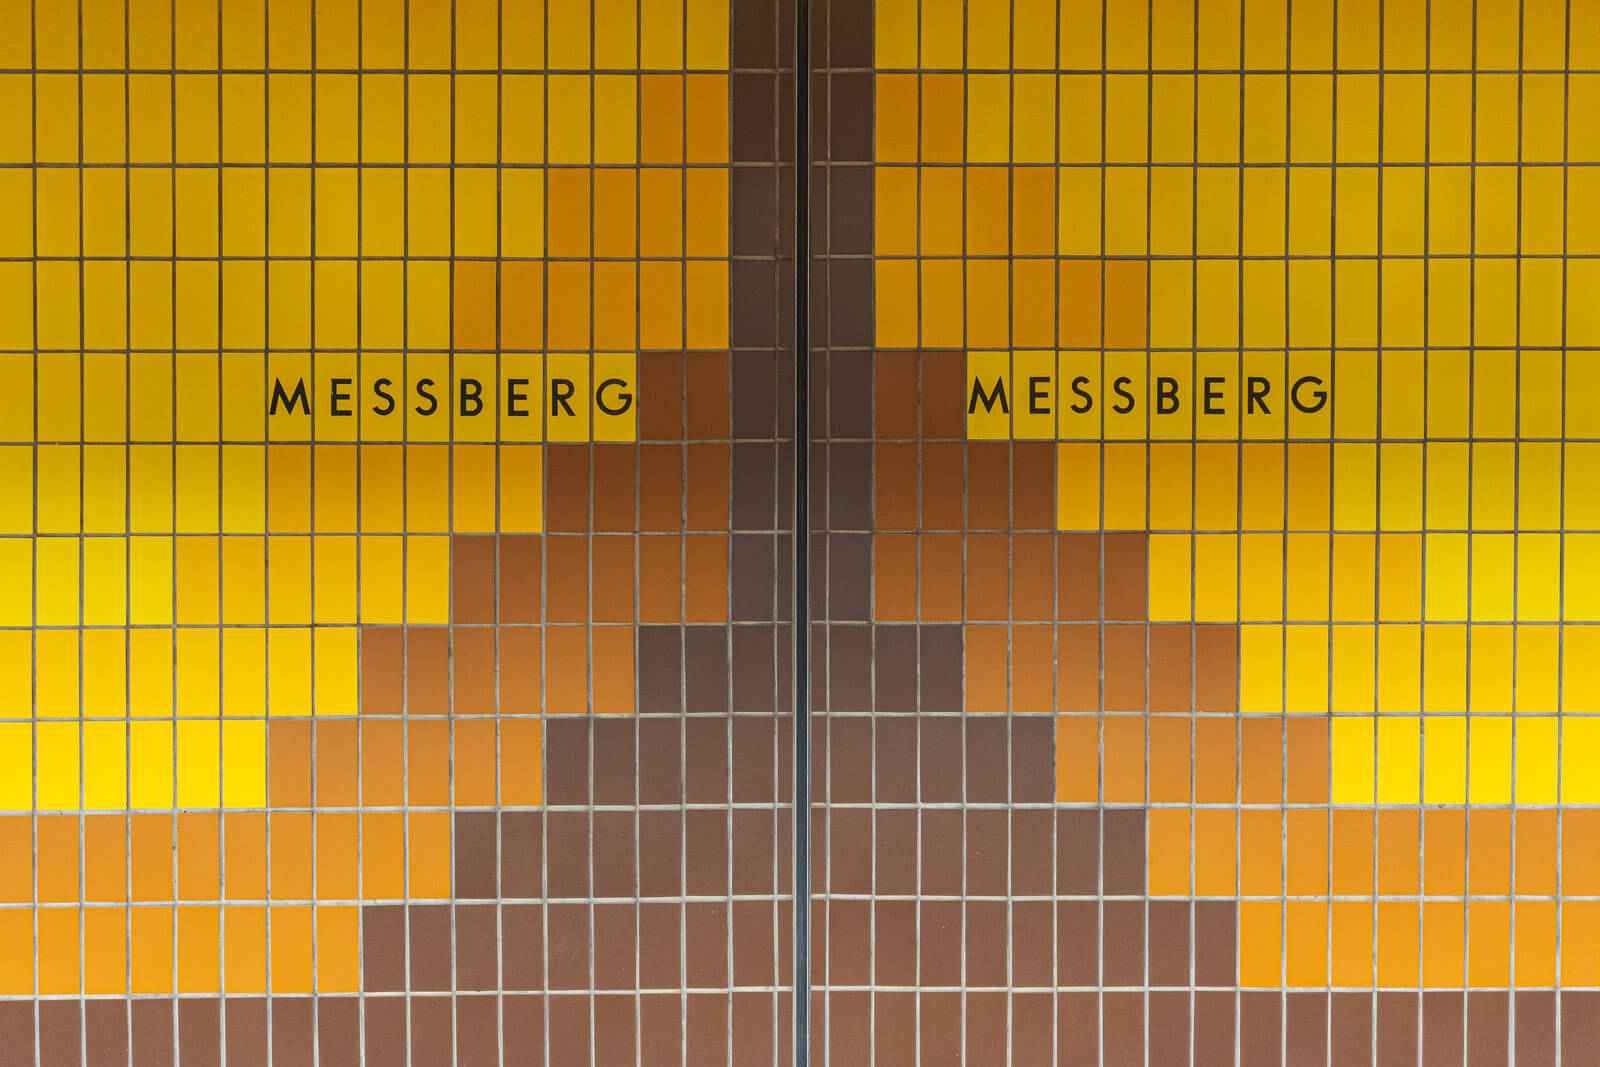 Messberg